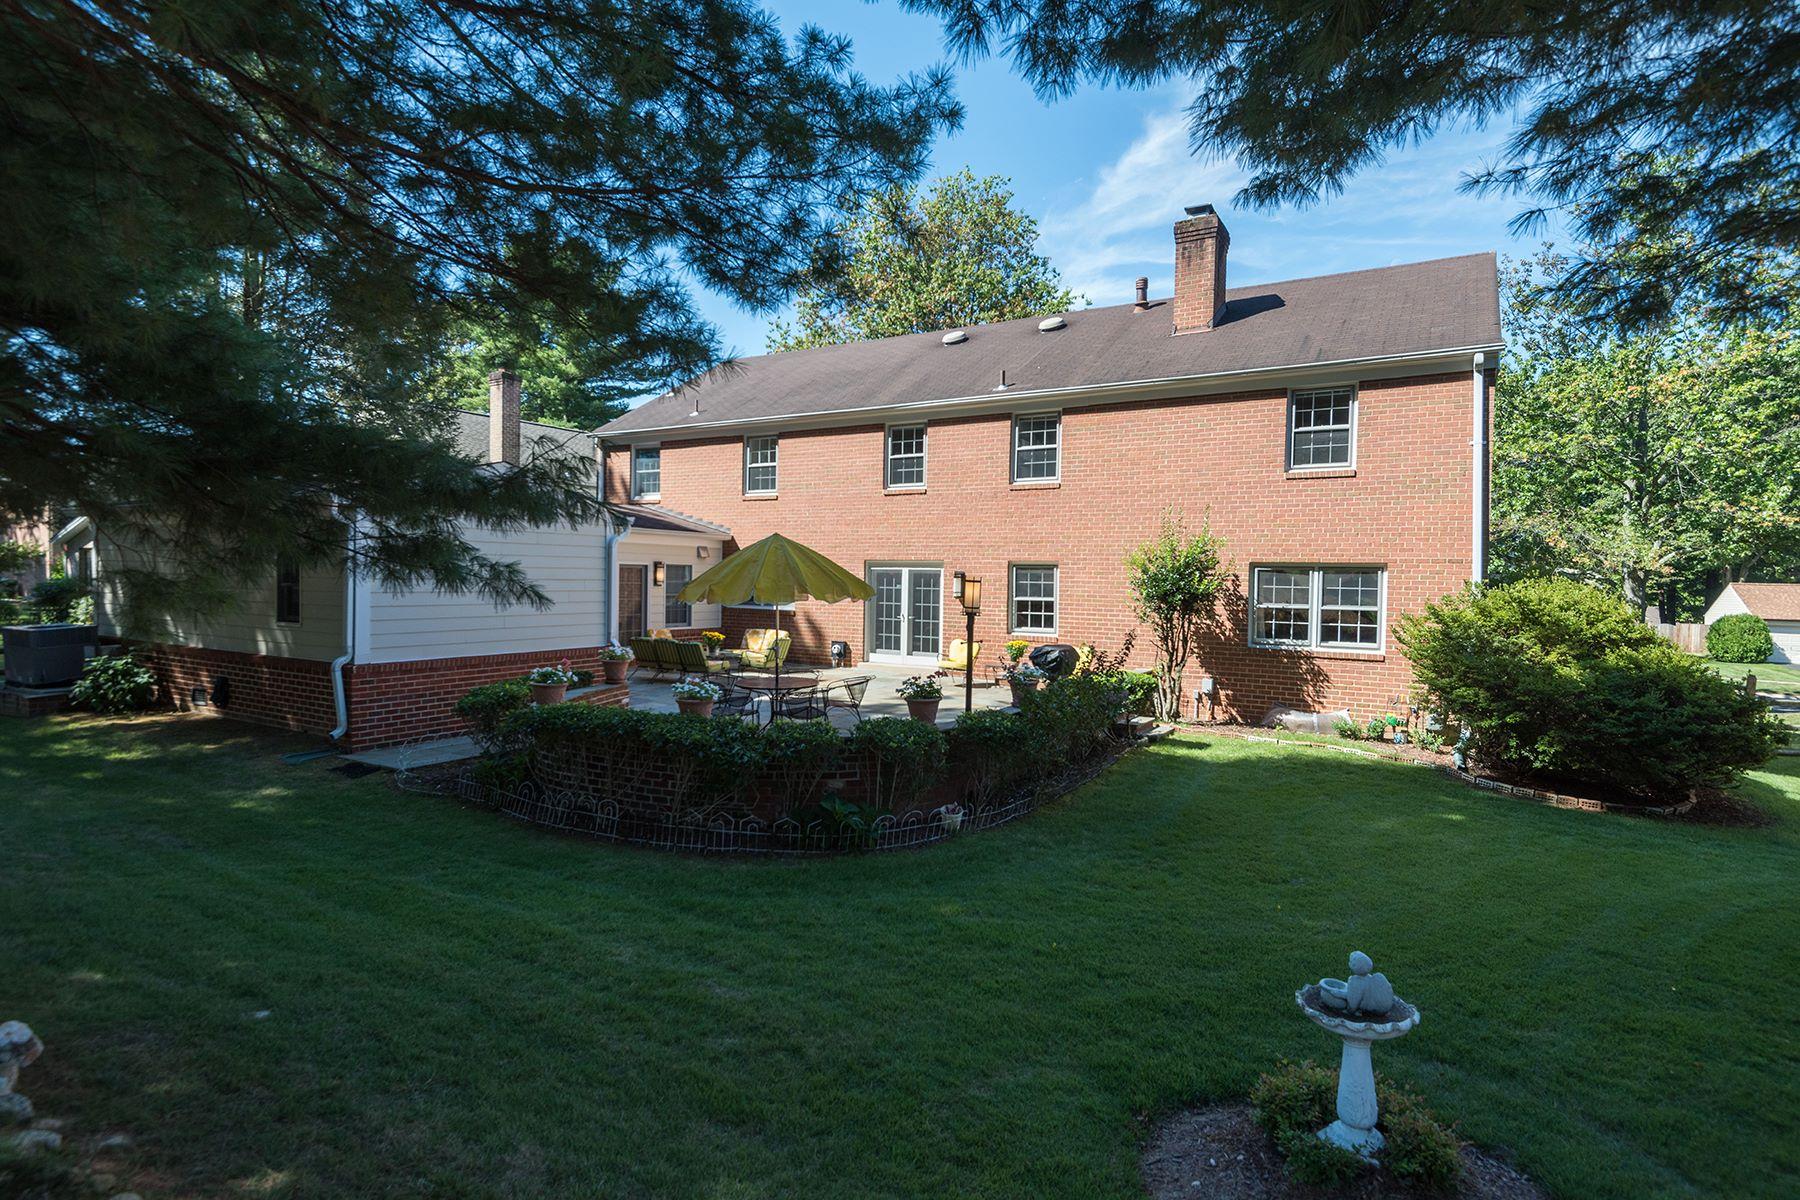 Additional photo for property listing at 9224 Falls Chapel Way, Potomac  Potomac, Maryland 20854 Estados Unidos